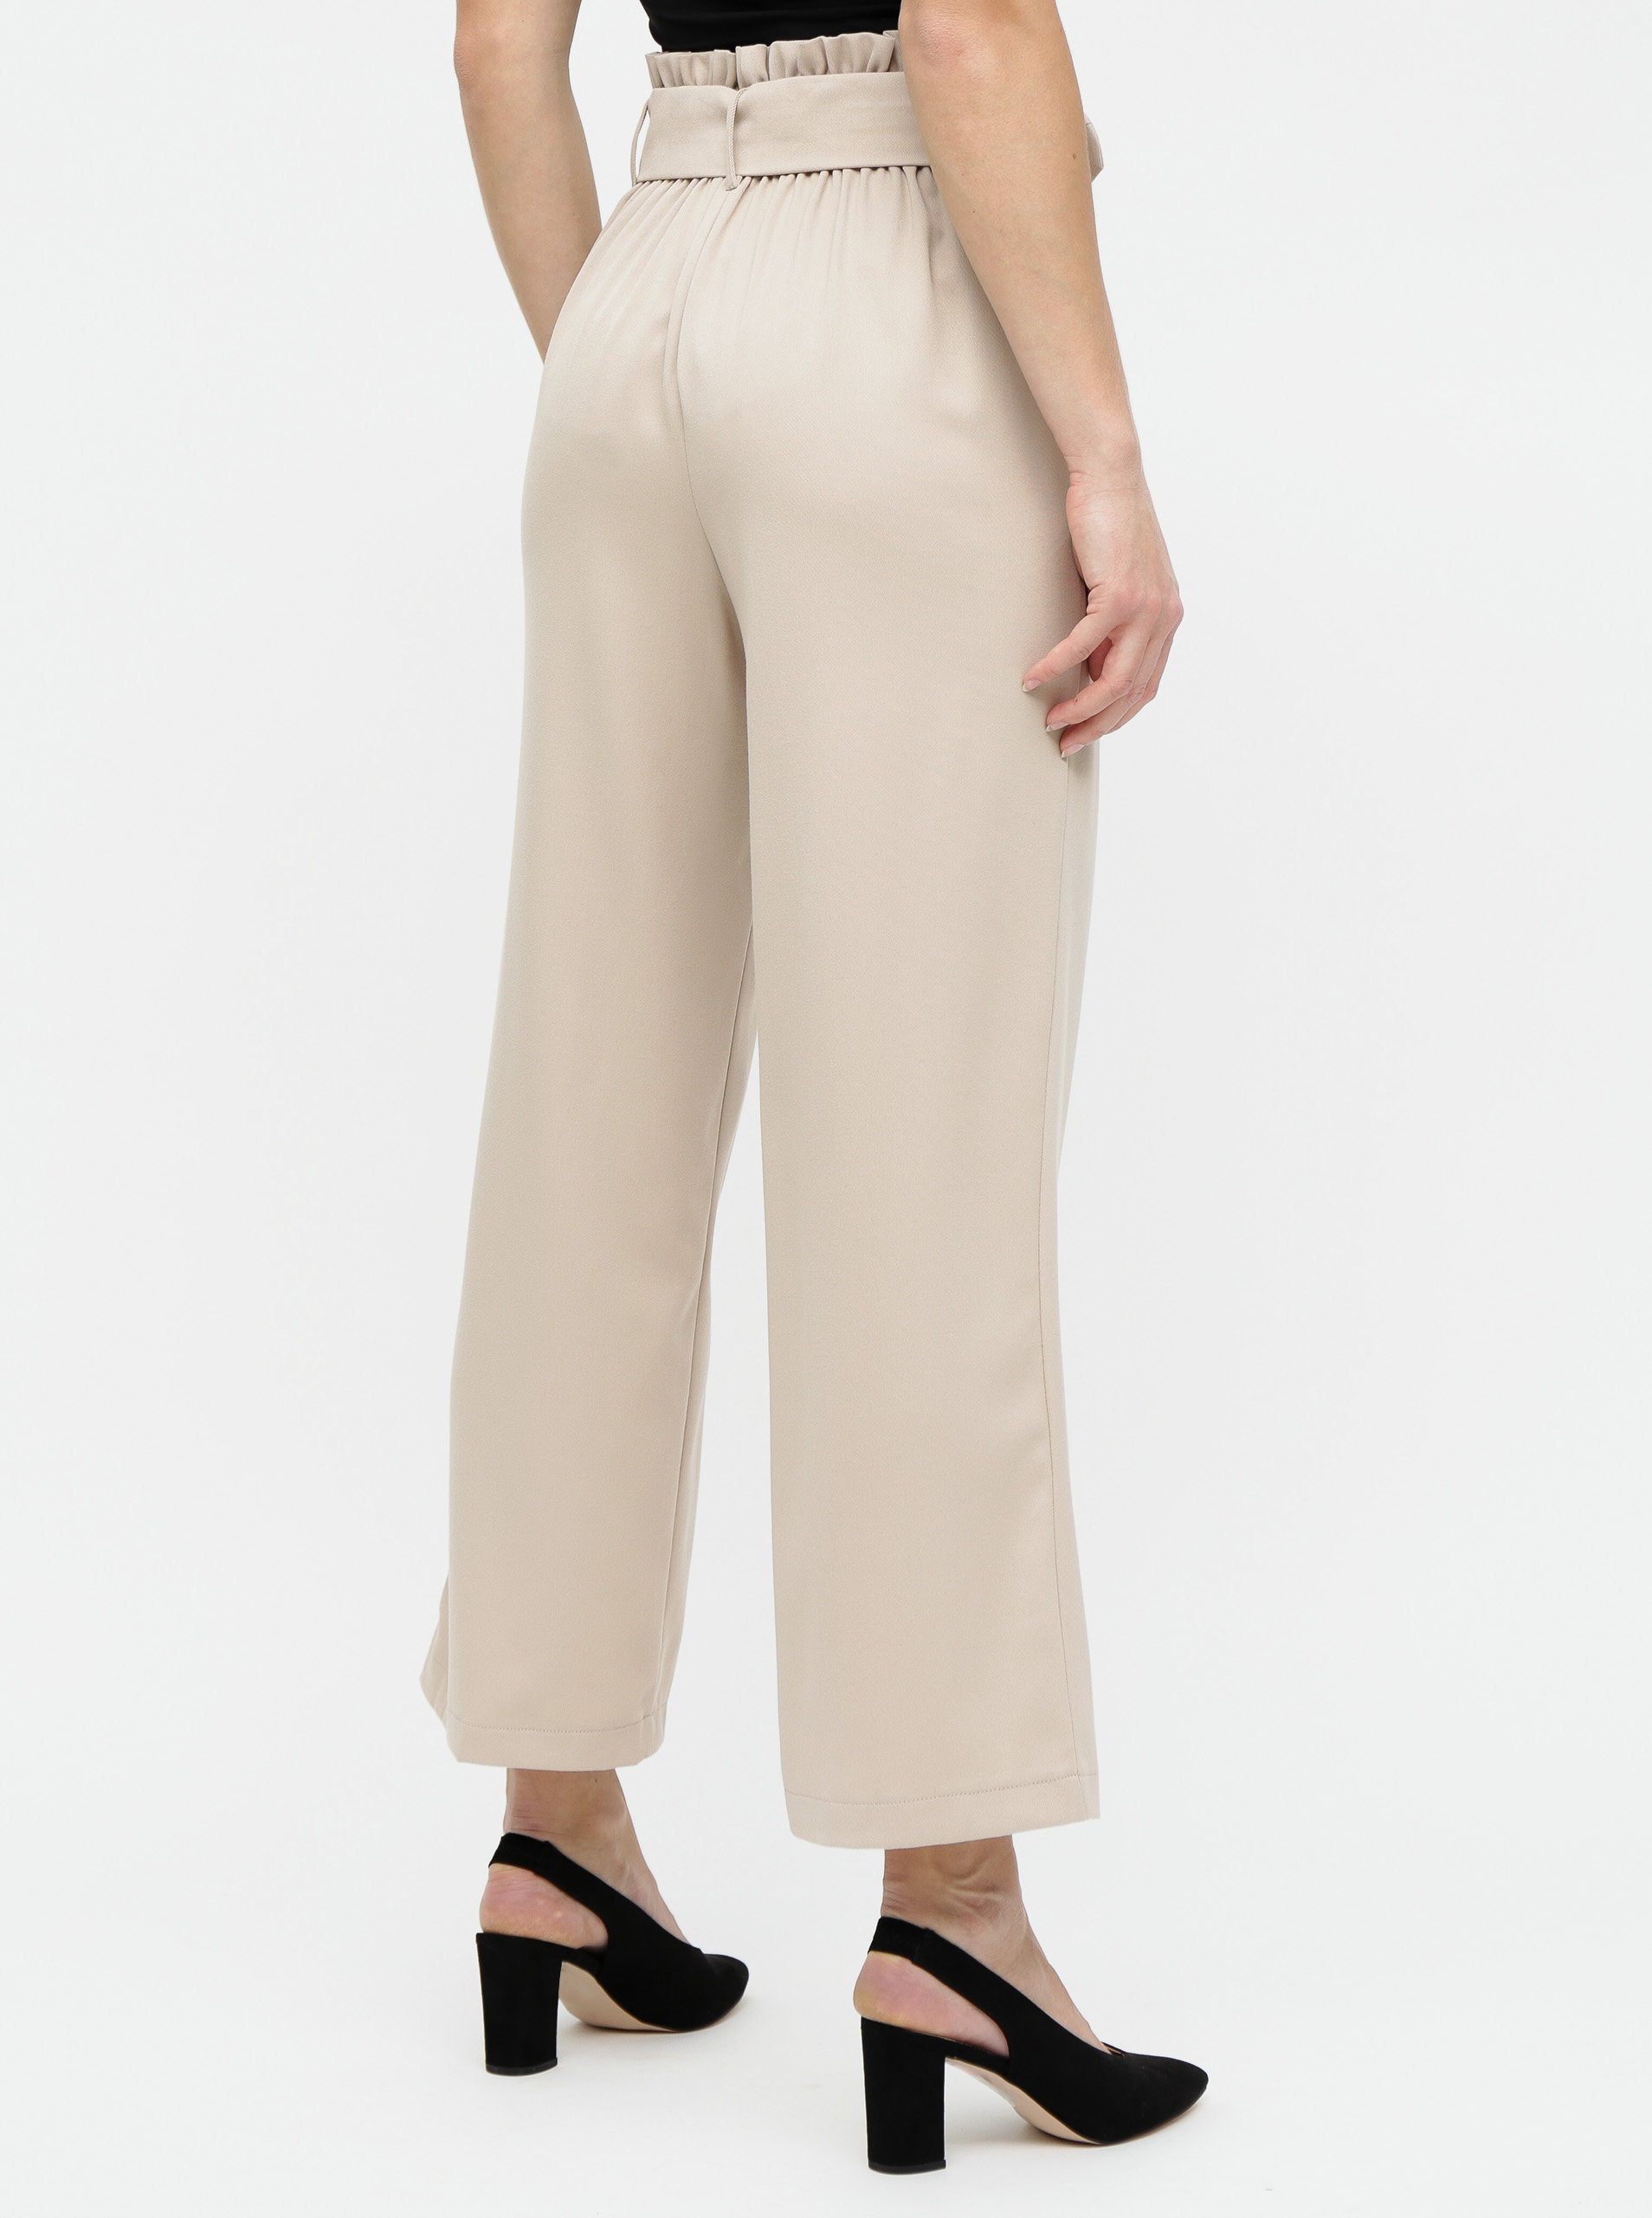 9c225b89d Béžové široké nohavice s opaskom a vysokým pásom TALLY WEiJL | ZOOT.sk